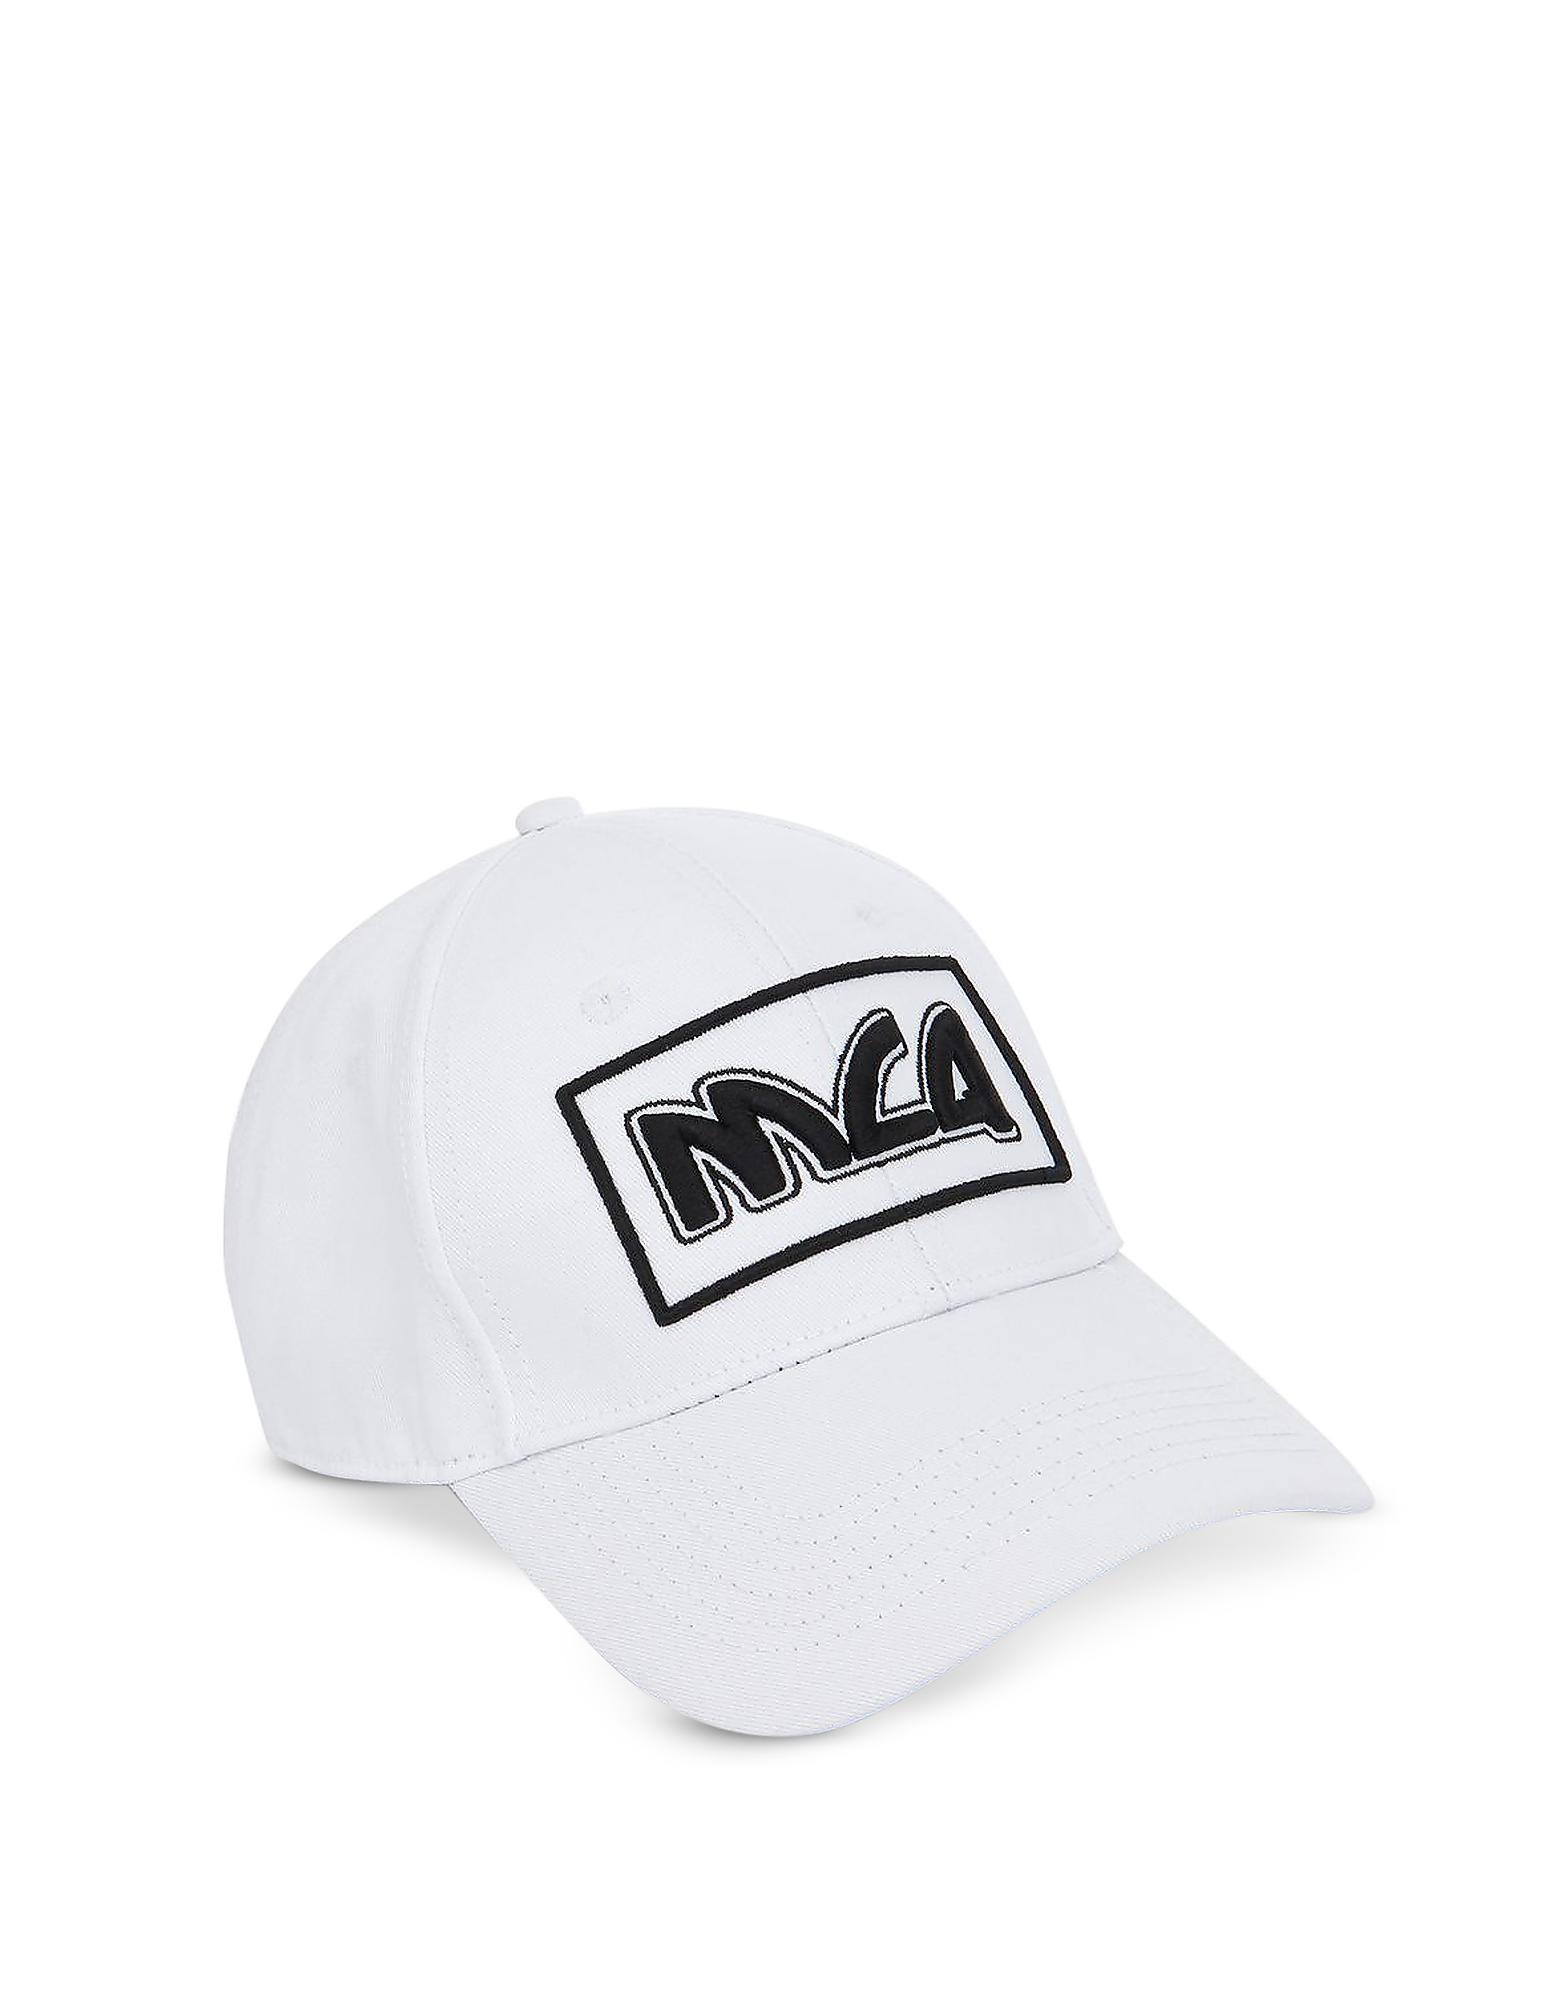 ccff7d7caaa ... Metal Logo Cotton Baseball Cap for Men - Lyst. View fullscreen